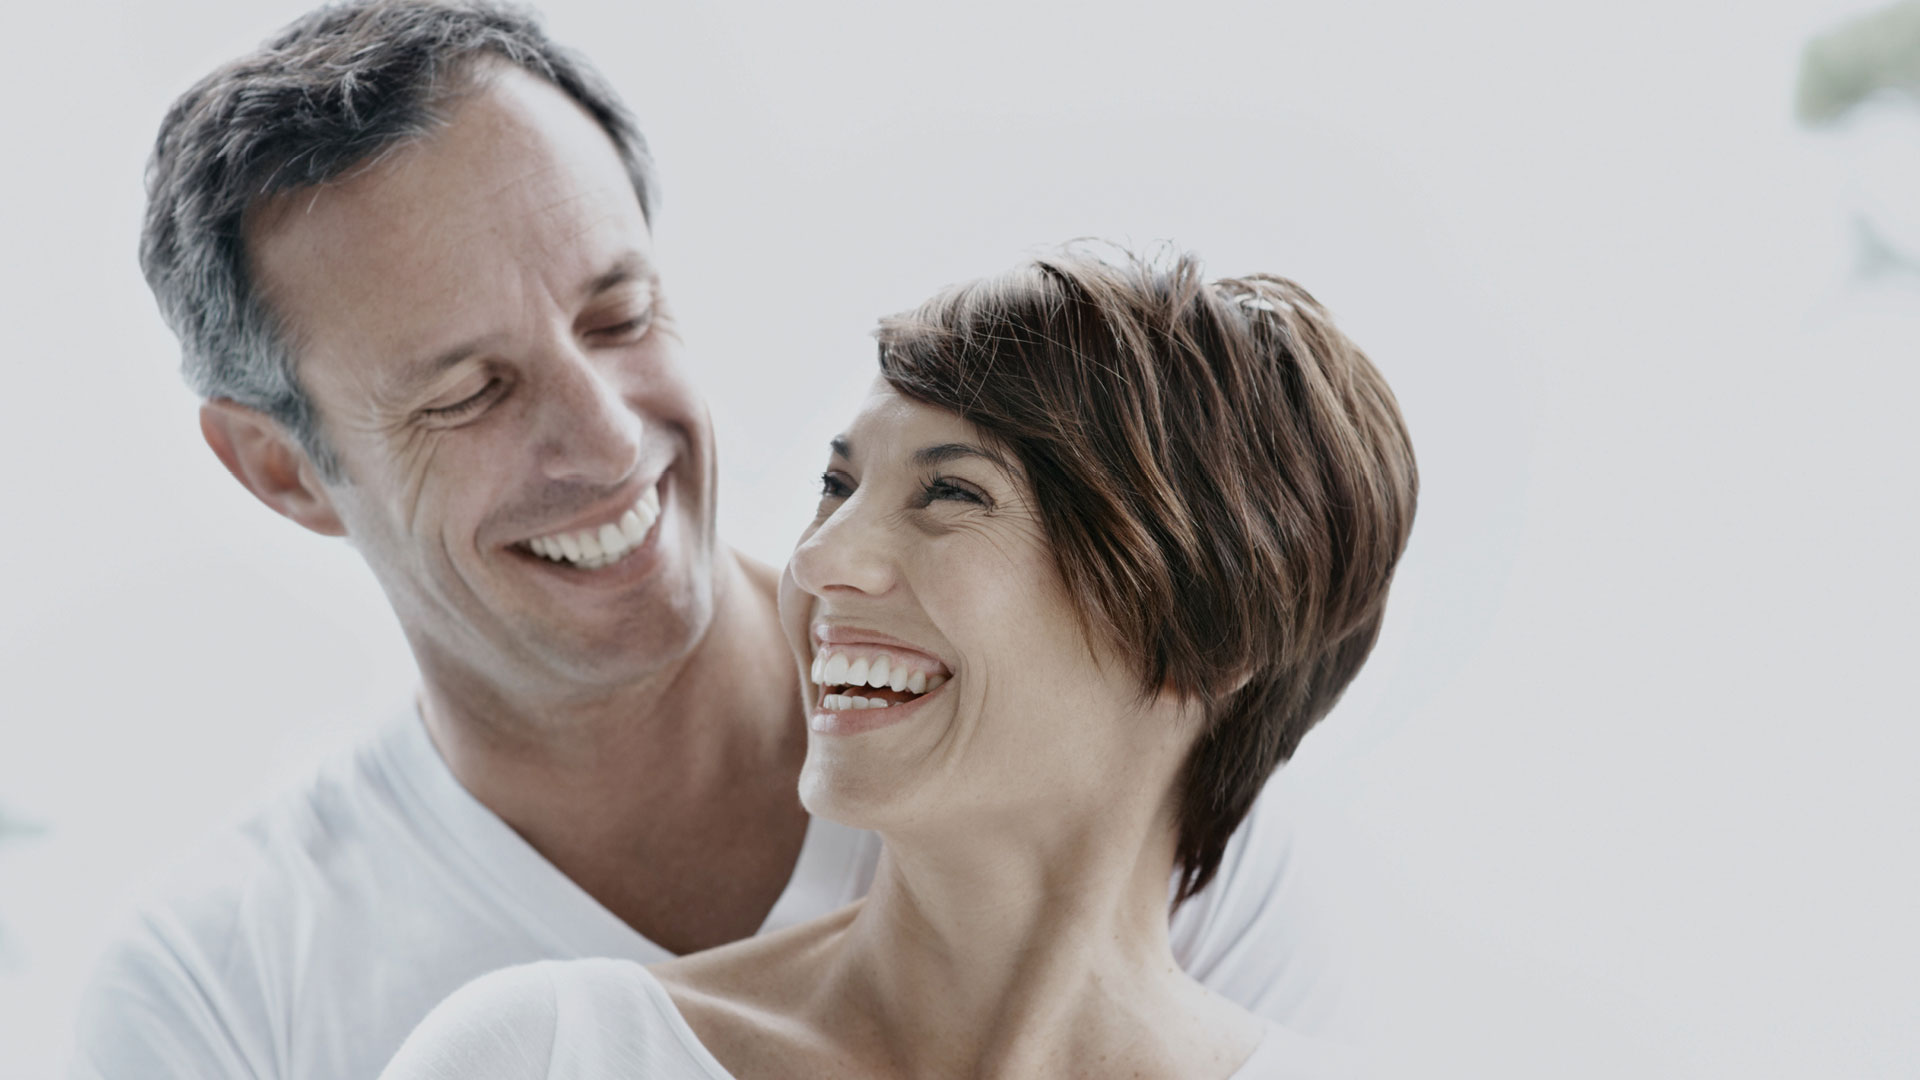 Sensational Smiles Dental Implants